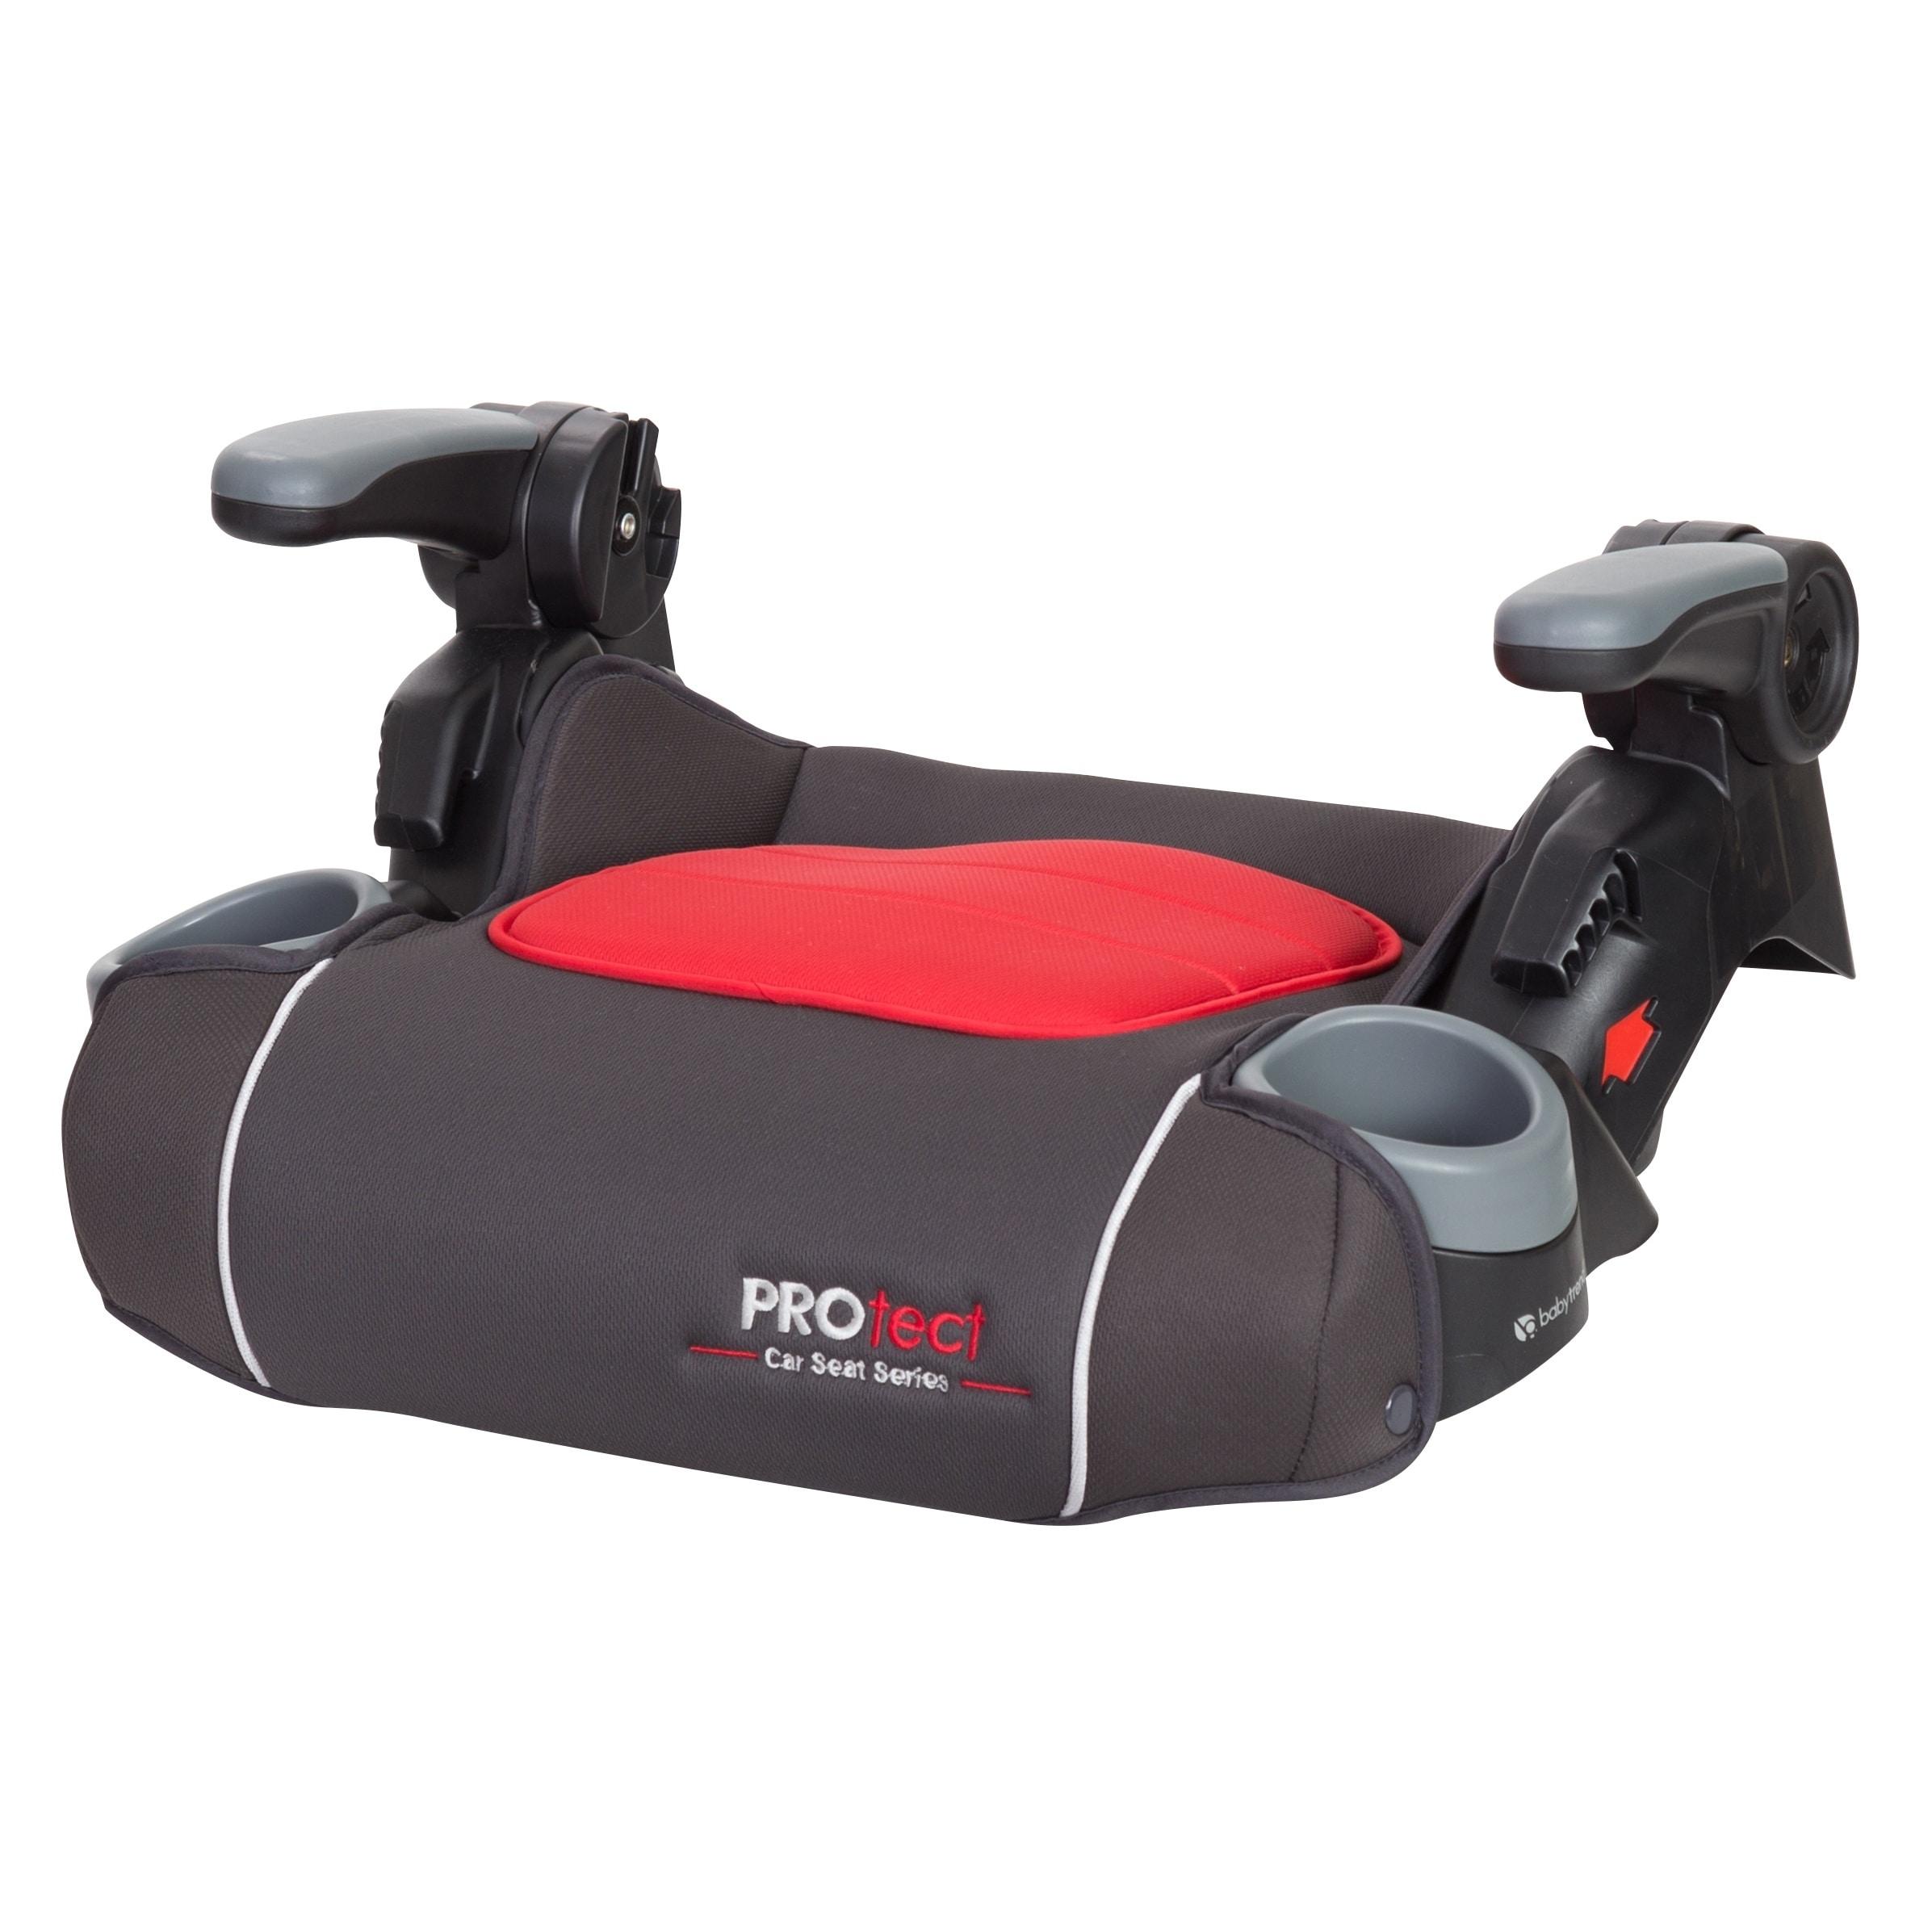 Shop Baby Trend Yumi 2 In 1 Folding Booster Car SeatSalsa